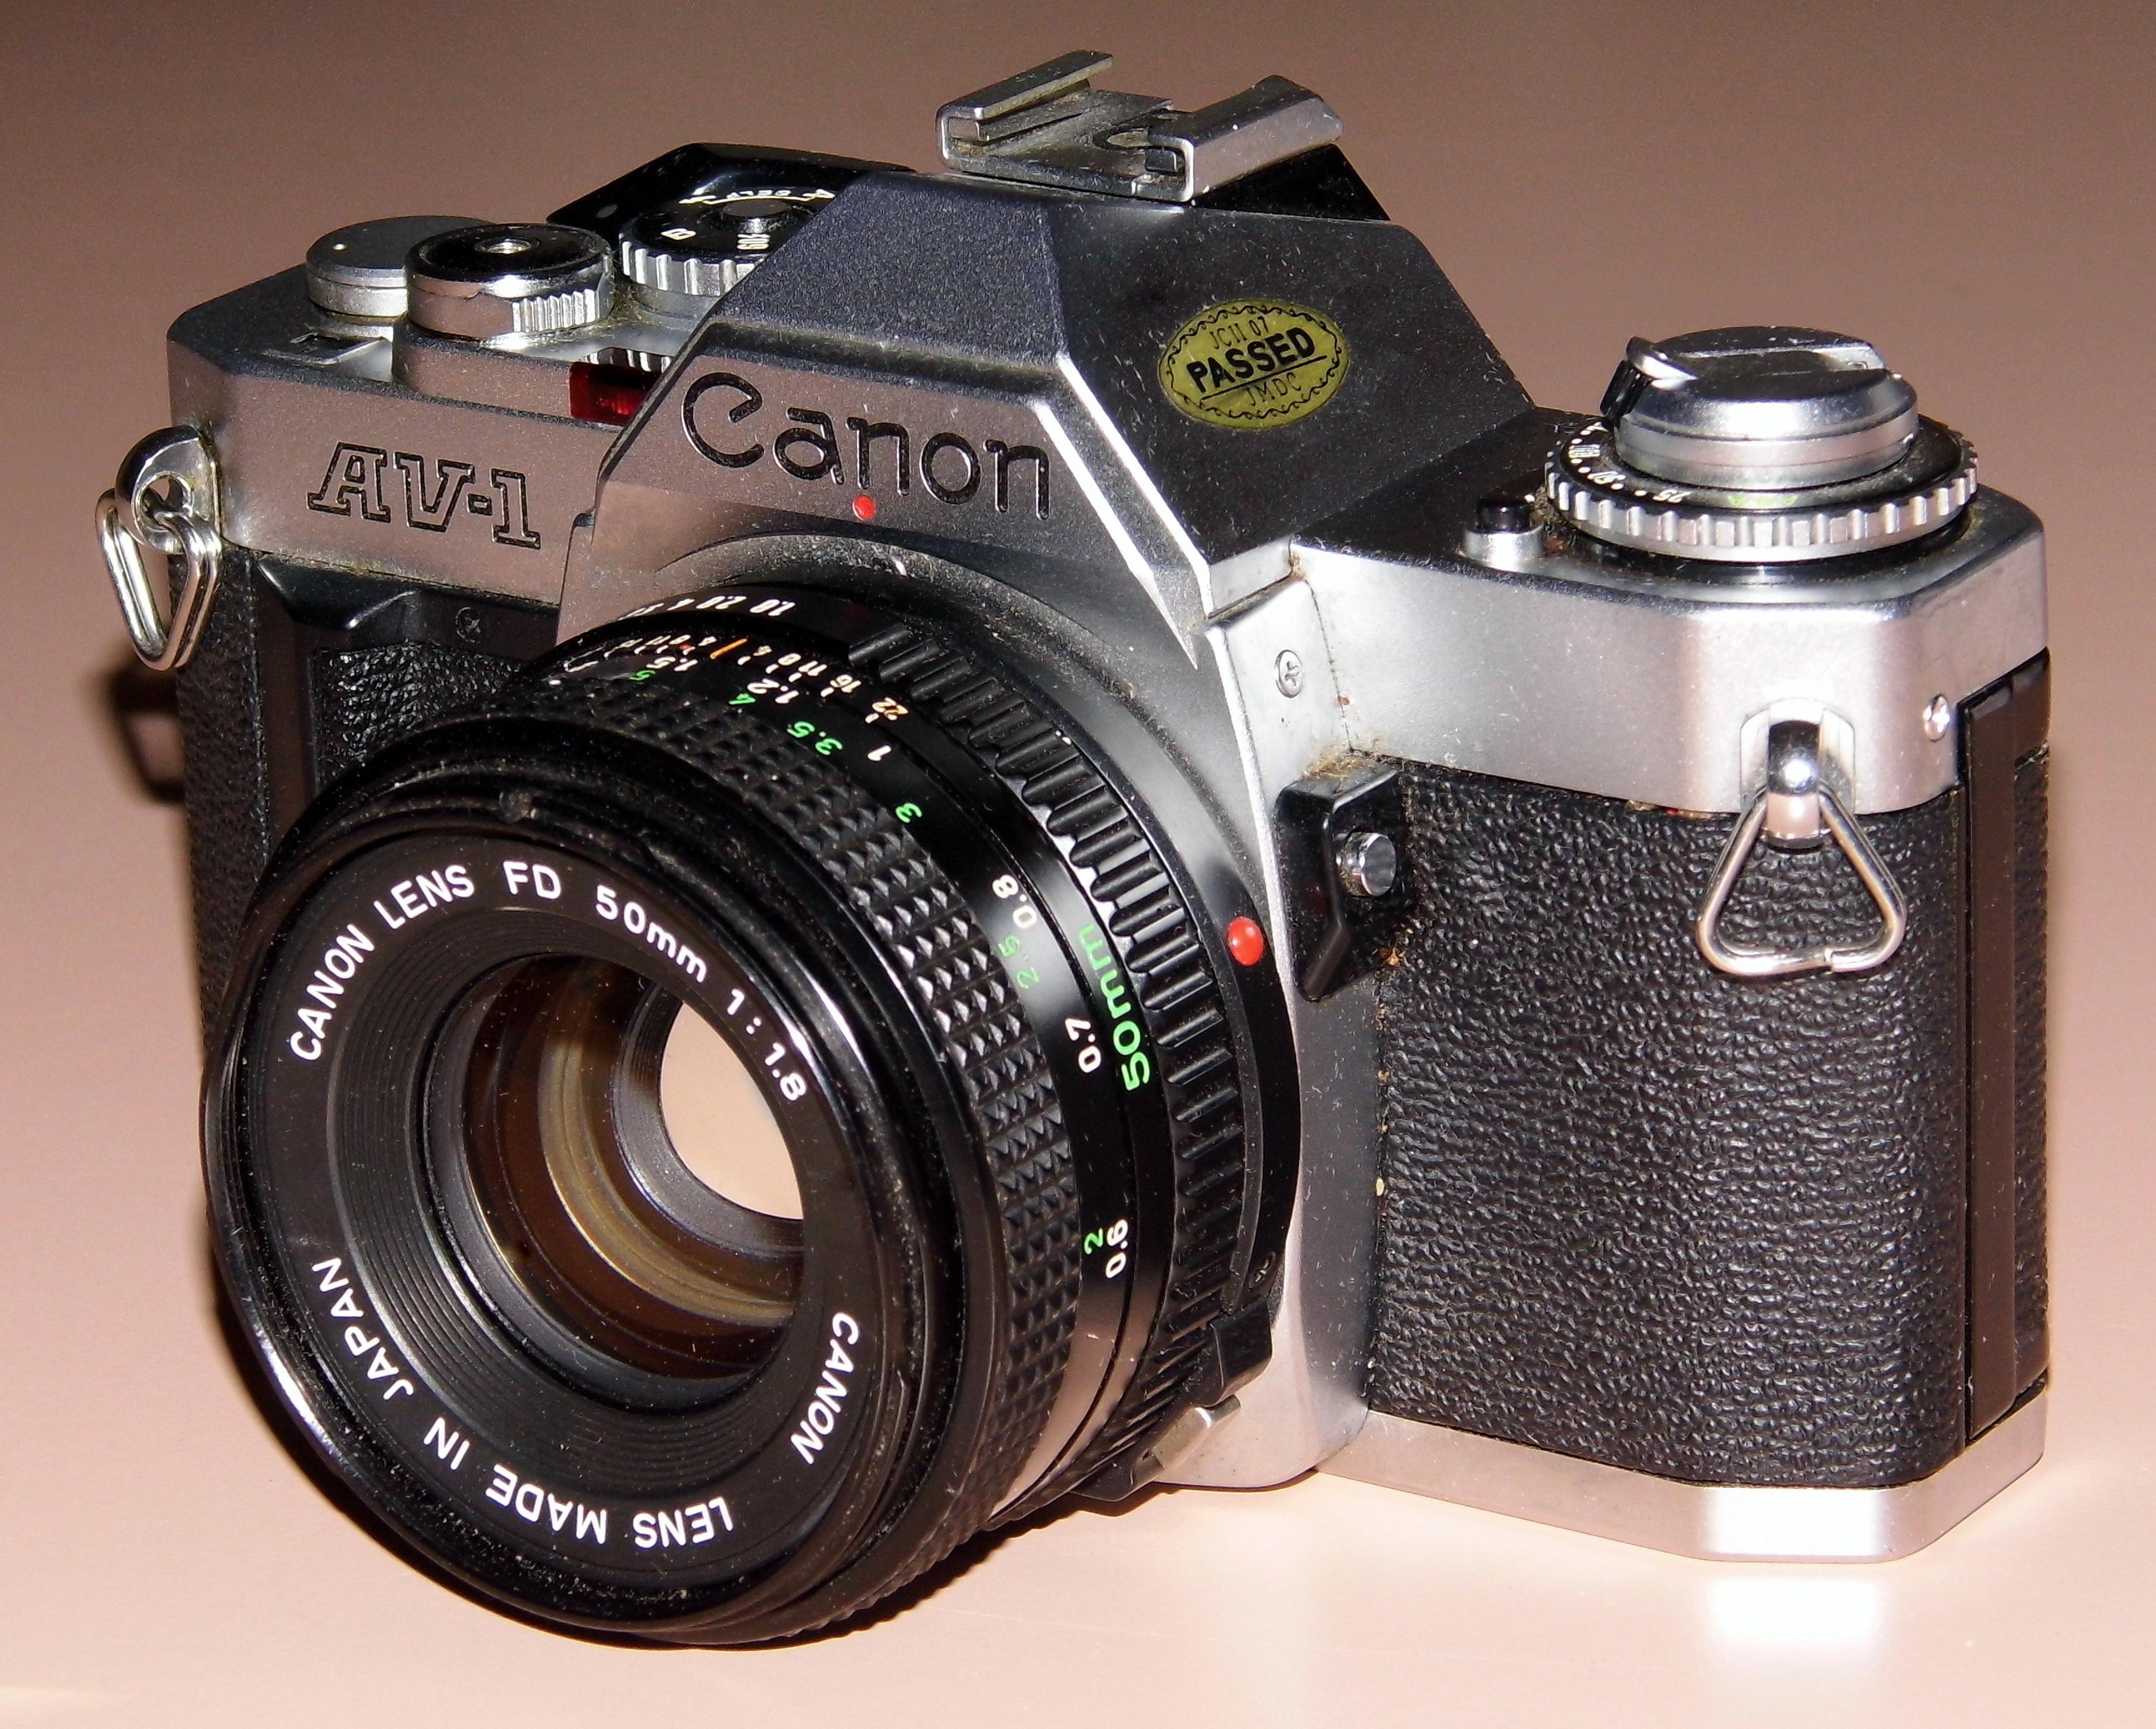 File:Vintage Canon AV-1 35mm SLR Film Camera, Made In ...